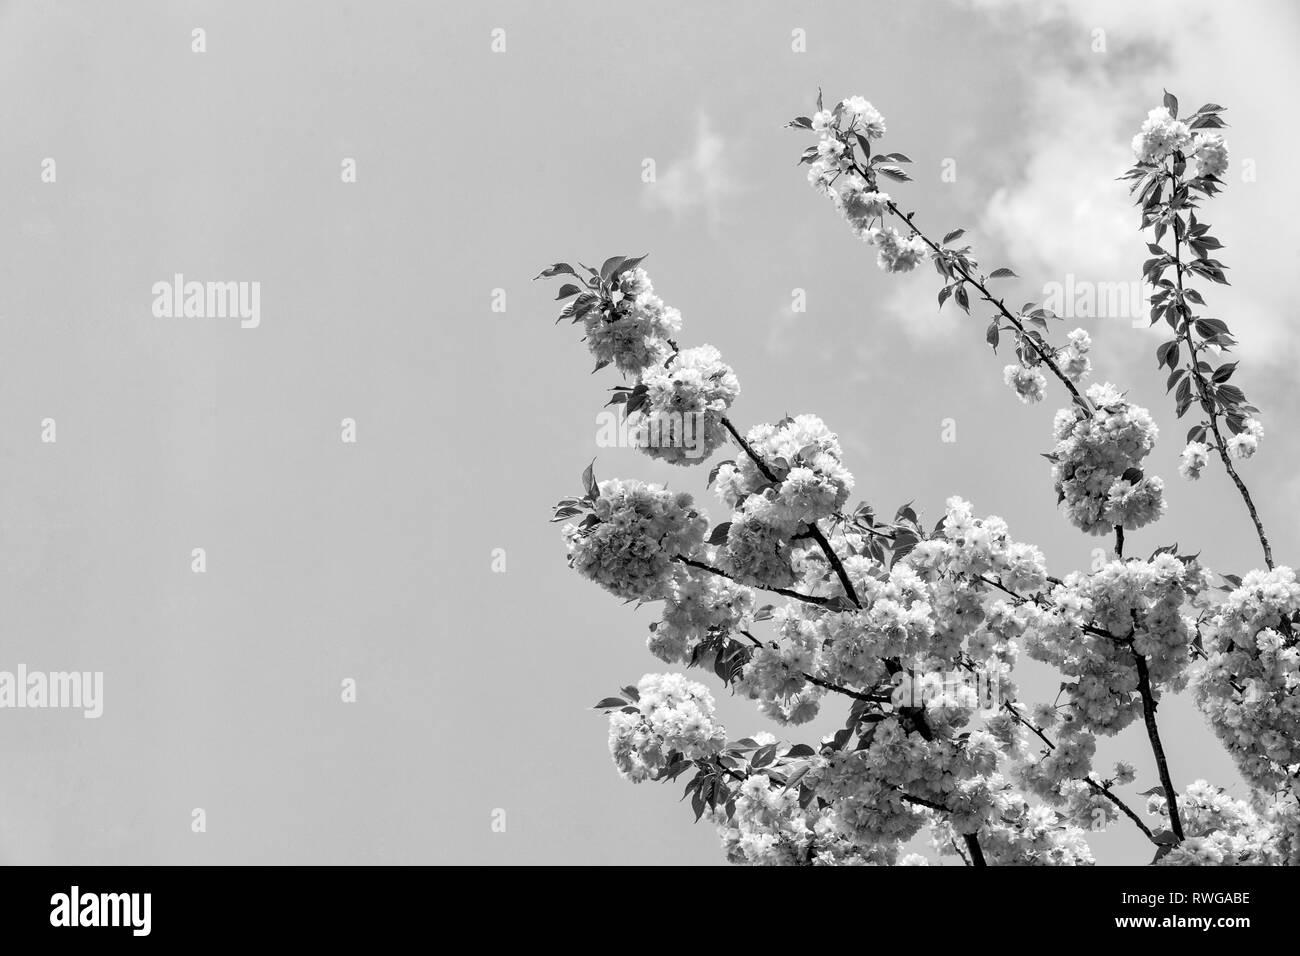 Renewal, rebirth, new life awakening. Sakura tree in blossom on blue sky. Cherry flowers blossoming in spring. Sakura blooming season concept. Nature, beauty, environment, copy space - Stock Image